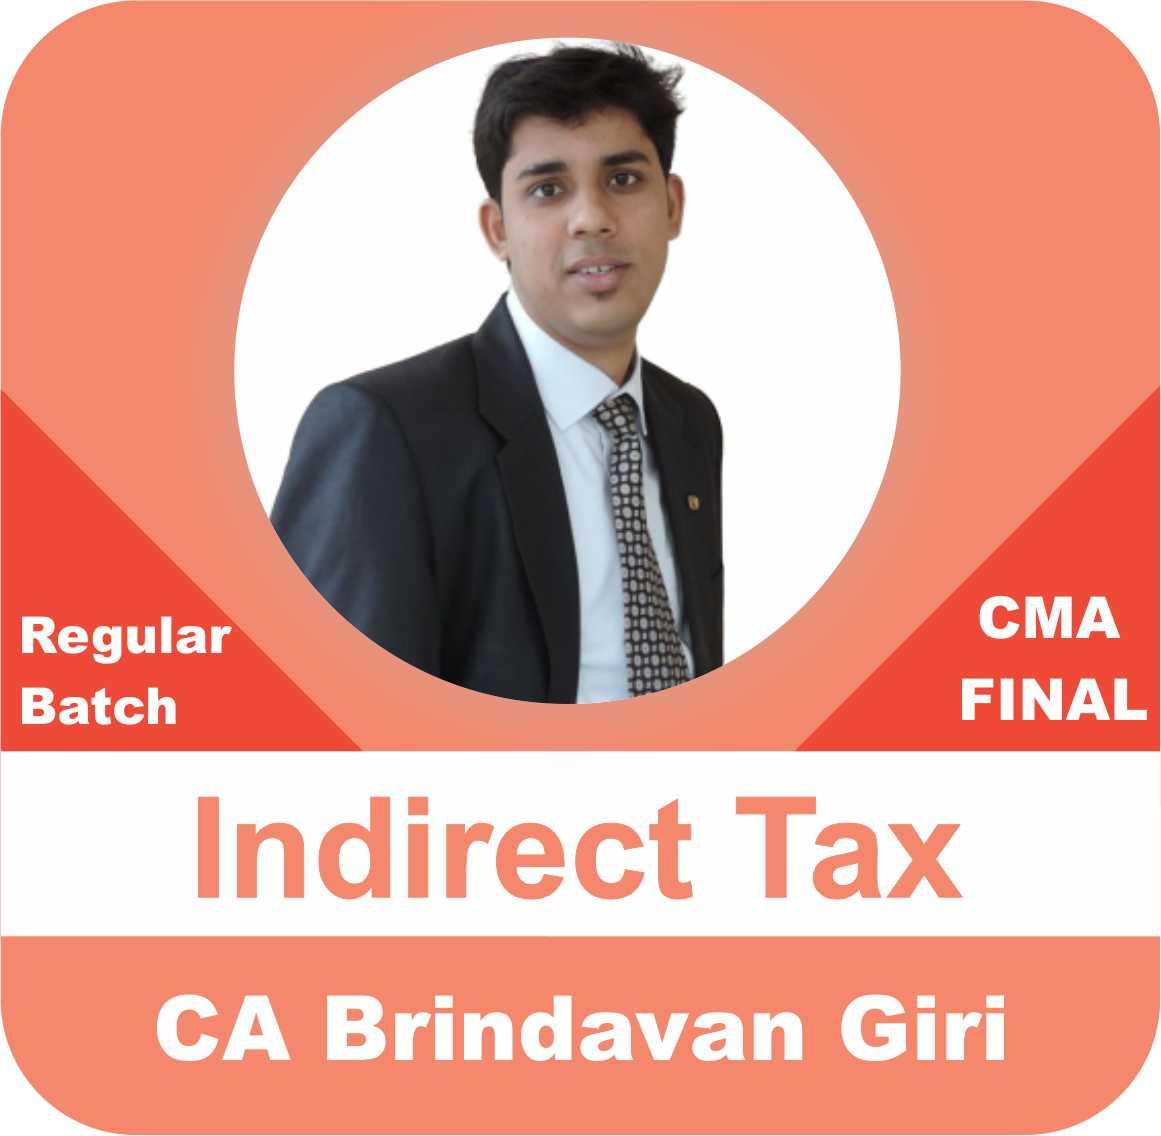 Indirect Tax Regular Batch